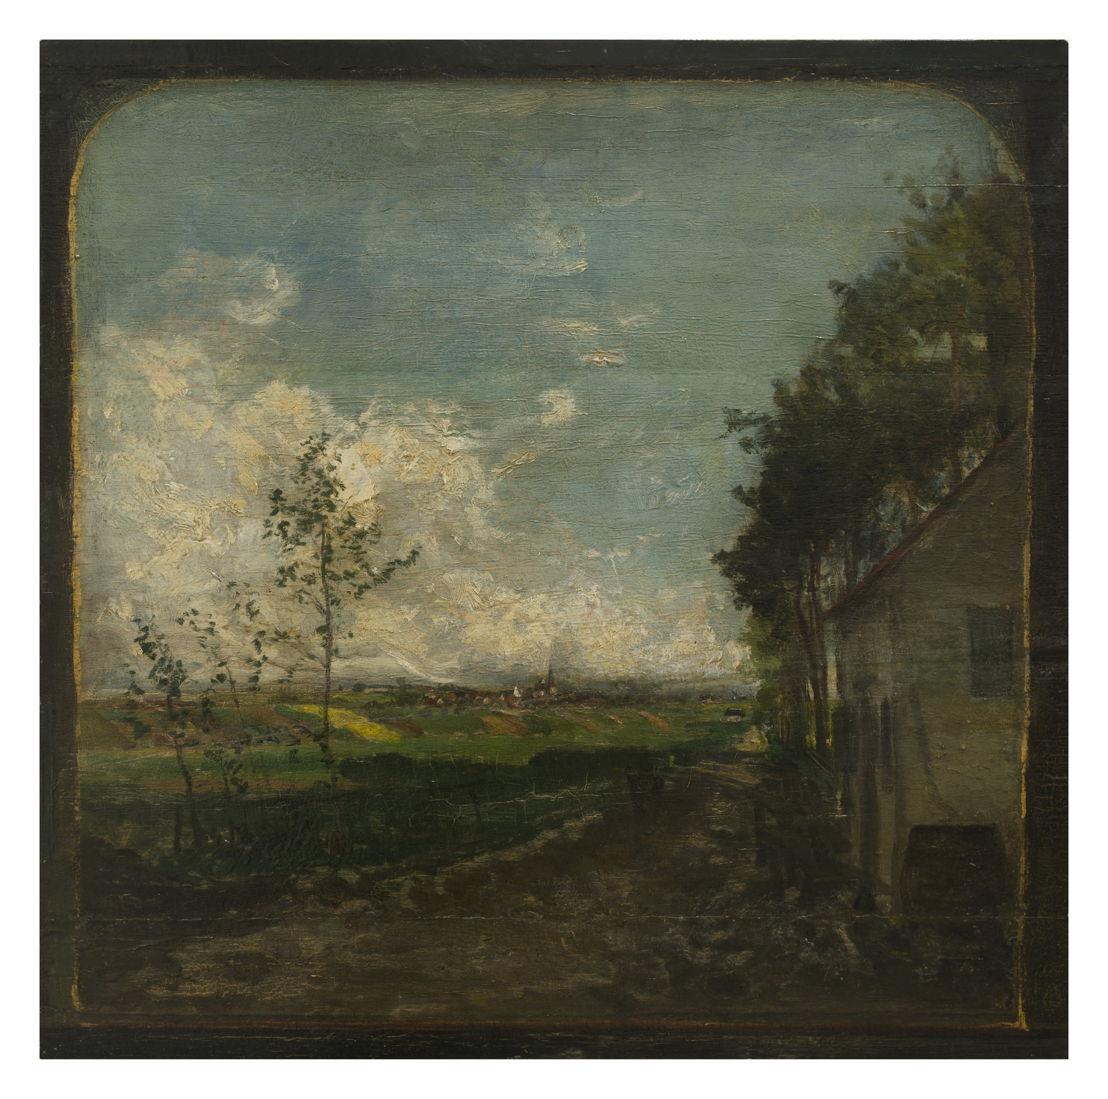 Hippolyte Boulenger, Signe de 't Oud Bareelke © Isabelle Arthuis